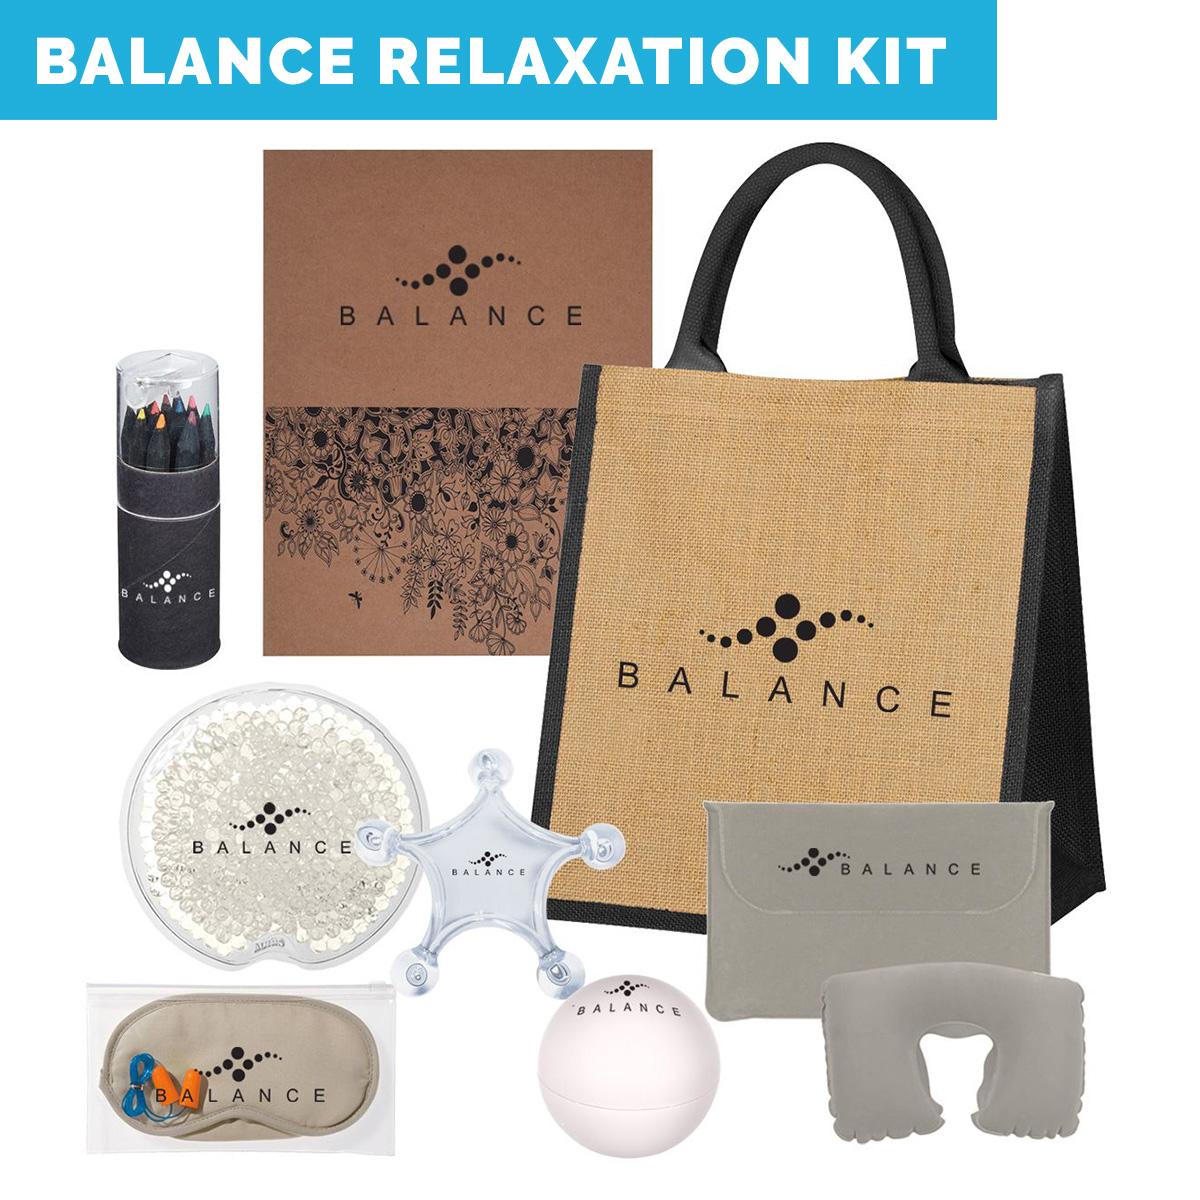 custom printed spa relaxation kit, home spa kits